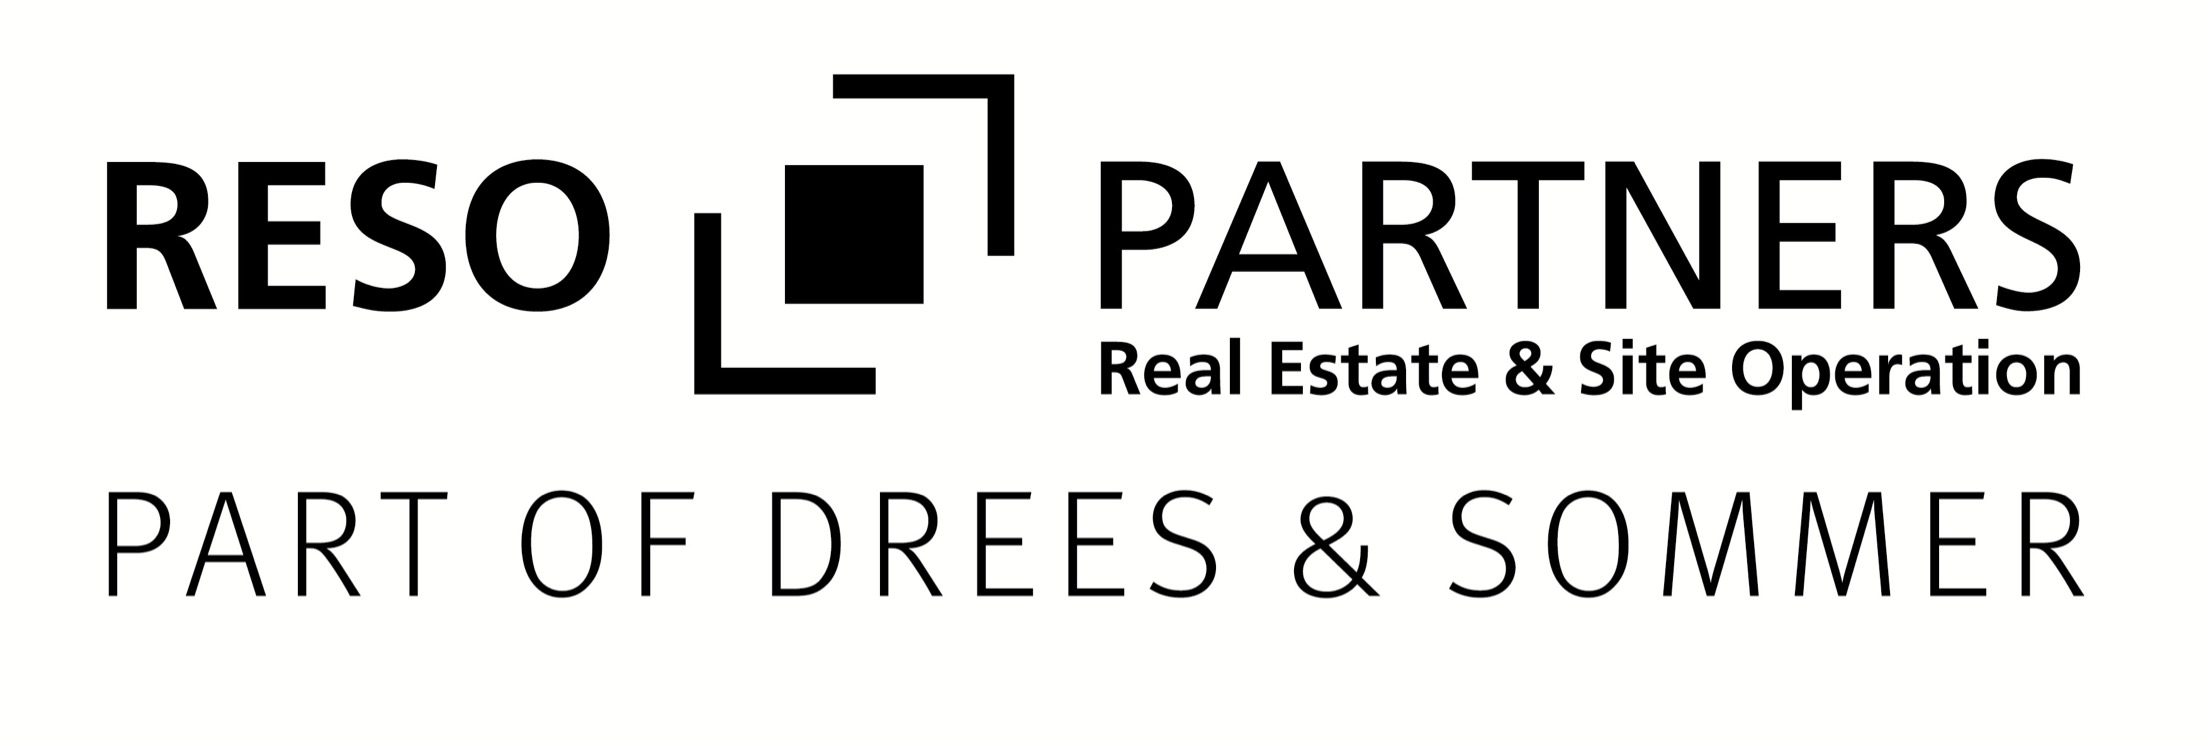 Drees & Sommer Schweiz acquiert Reso Partners SA